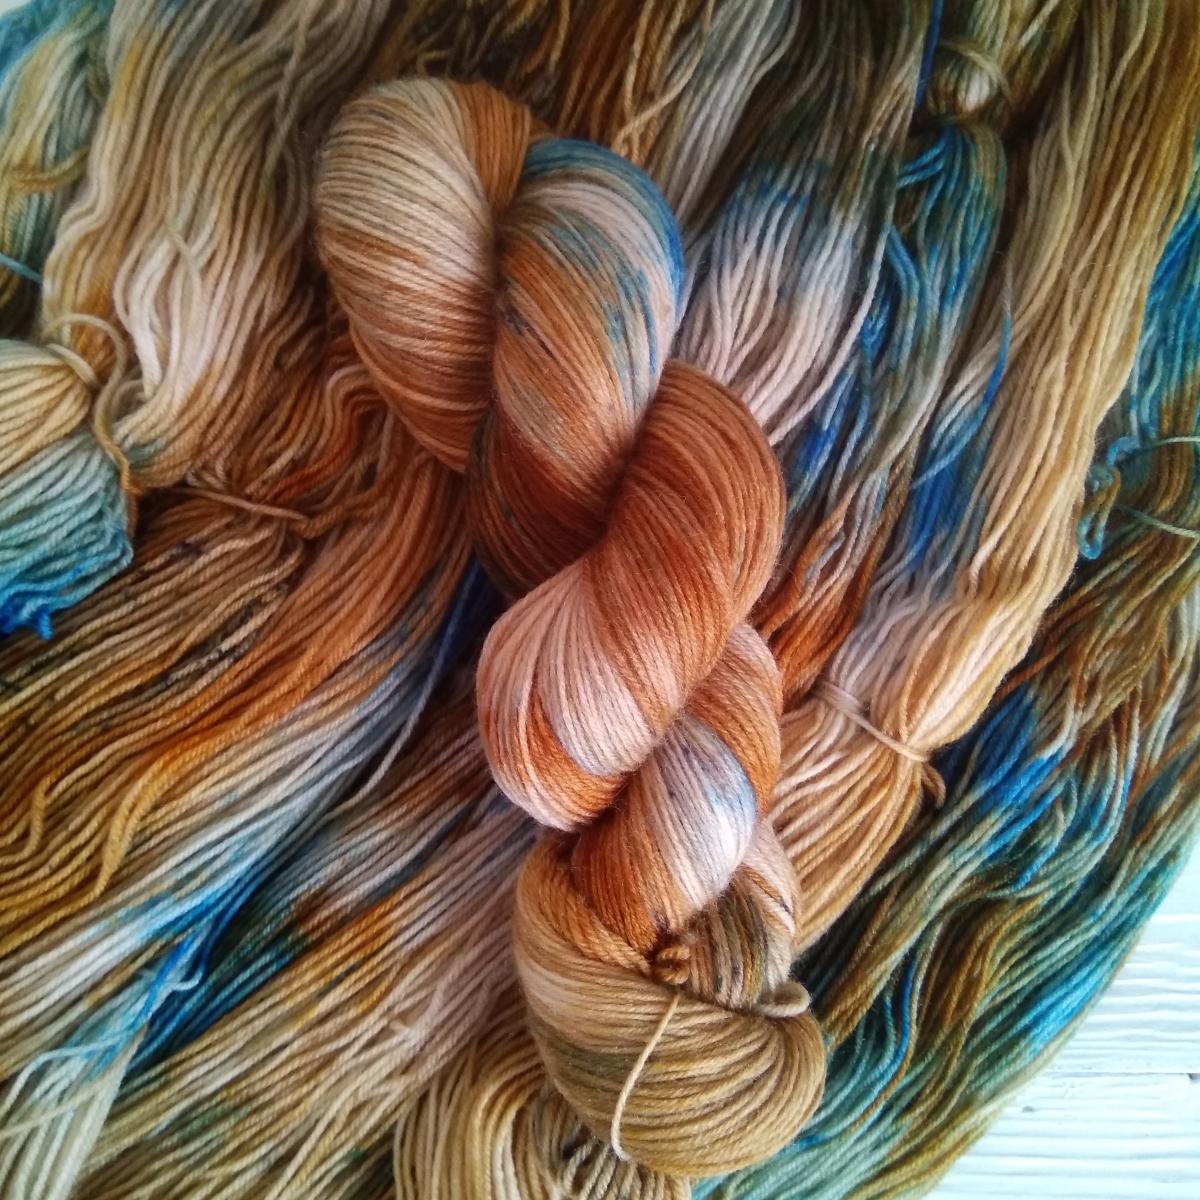 woodico.pro hand dyed yarn 036 3 1200x1200 - Hand dyed yarn / 036